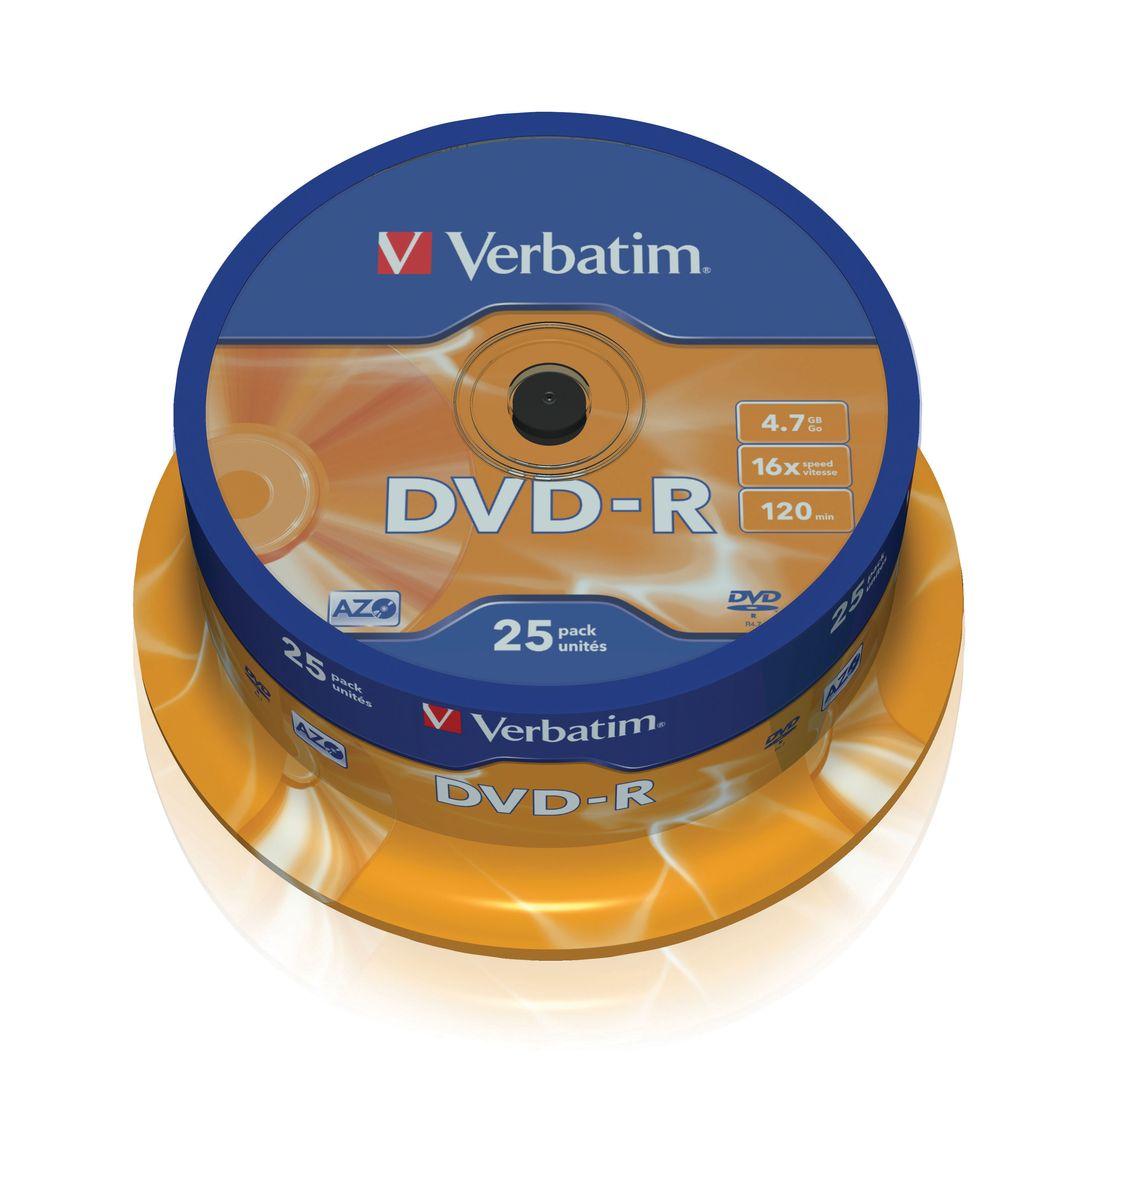 Verbatim DVD-R 4.7Gb 16x лазерный диск, 25 шт (Cake) - Расходные материалы